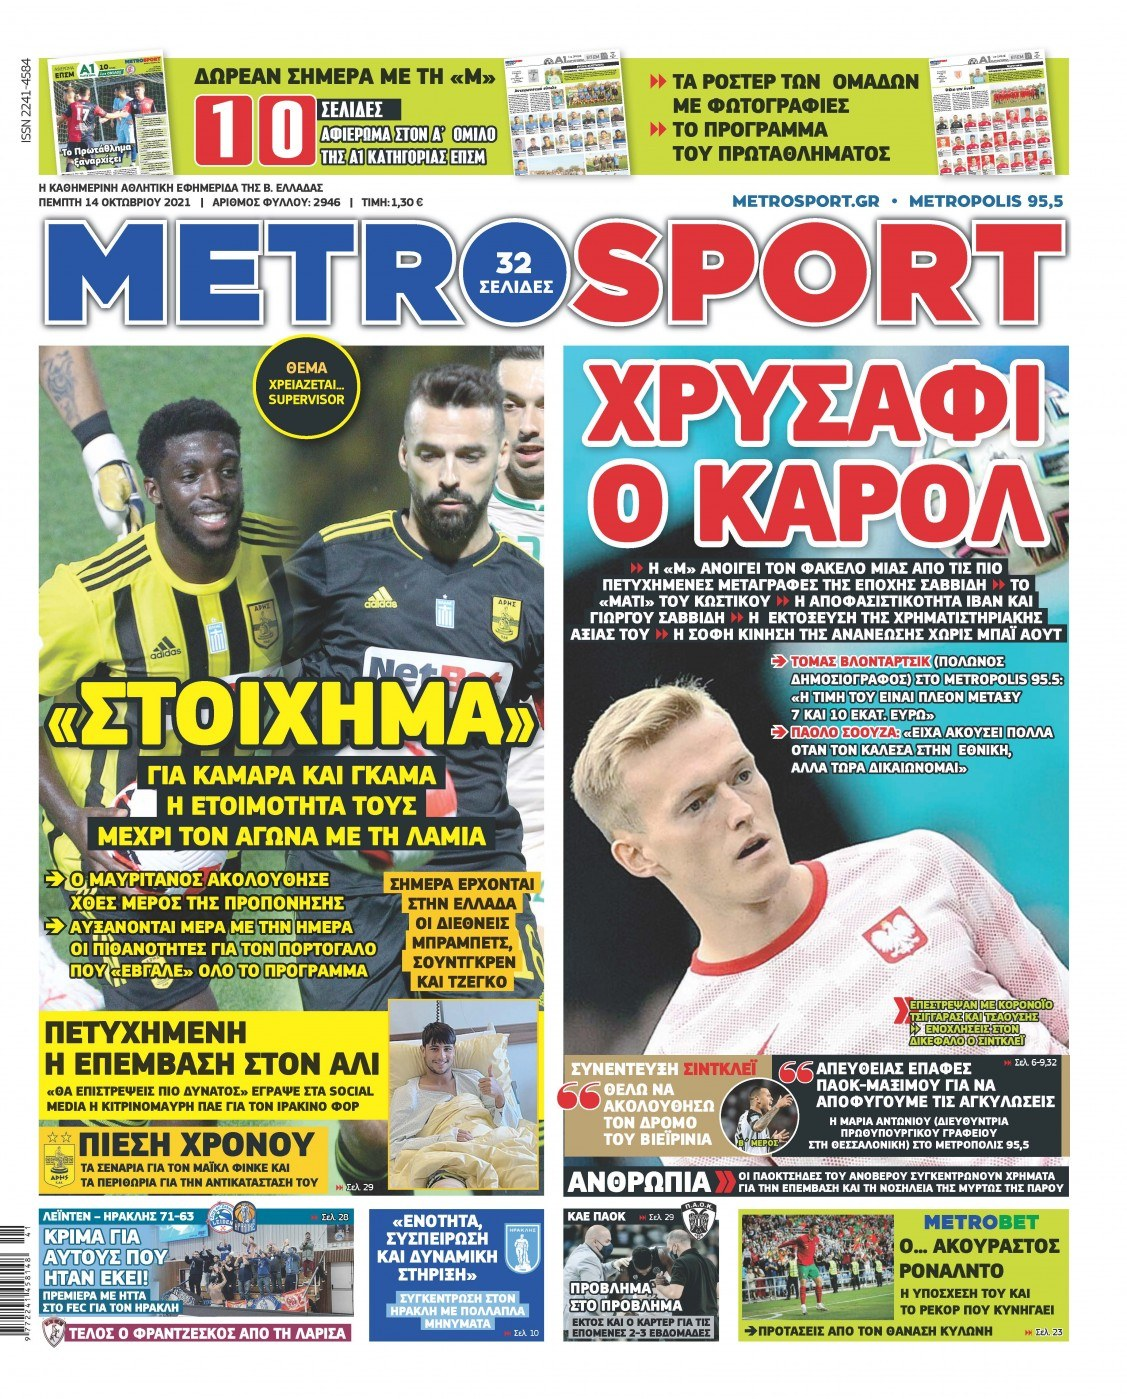 Metrosport 14.10